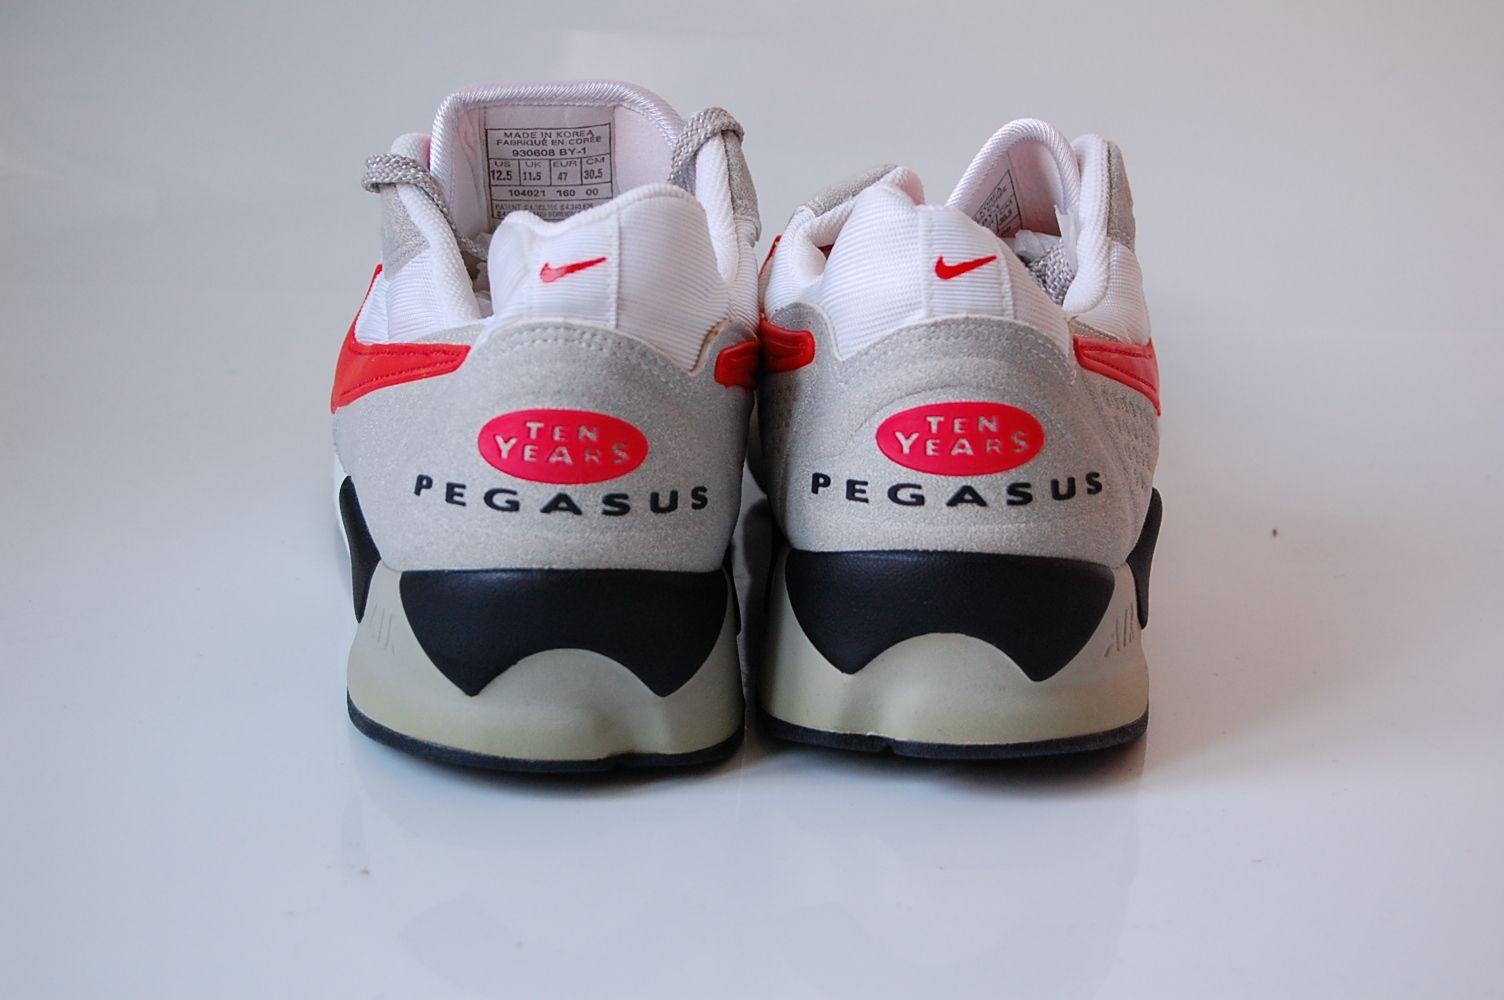 quality design 7193c 64ea4 Nike Air Pegasus 93